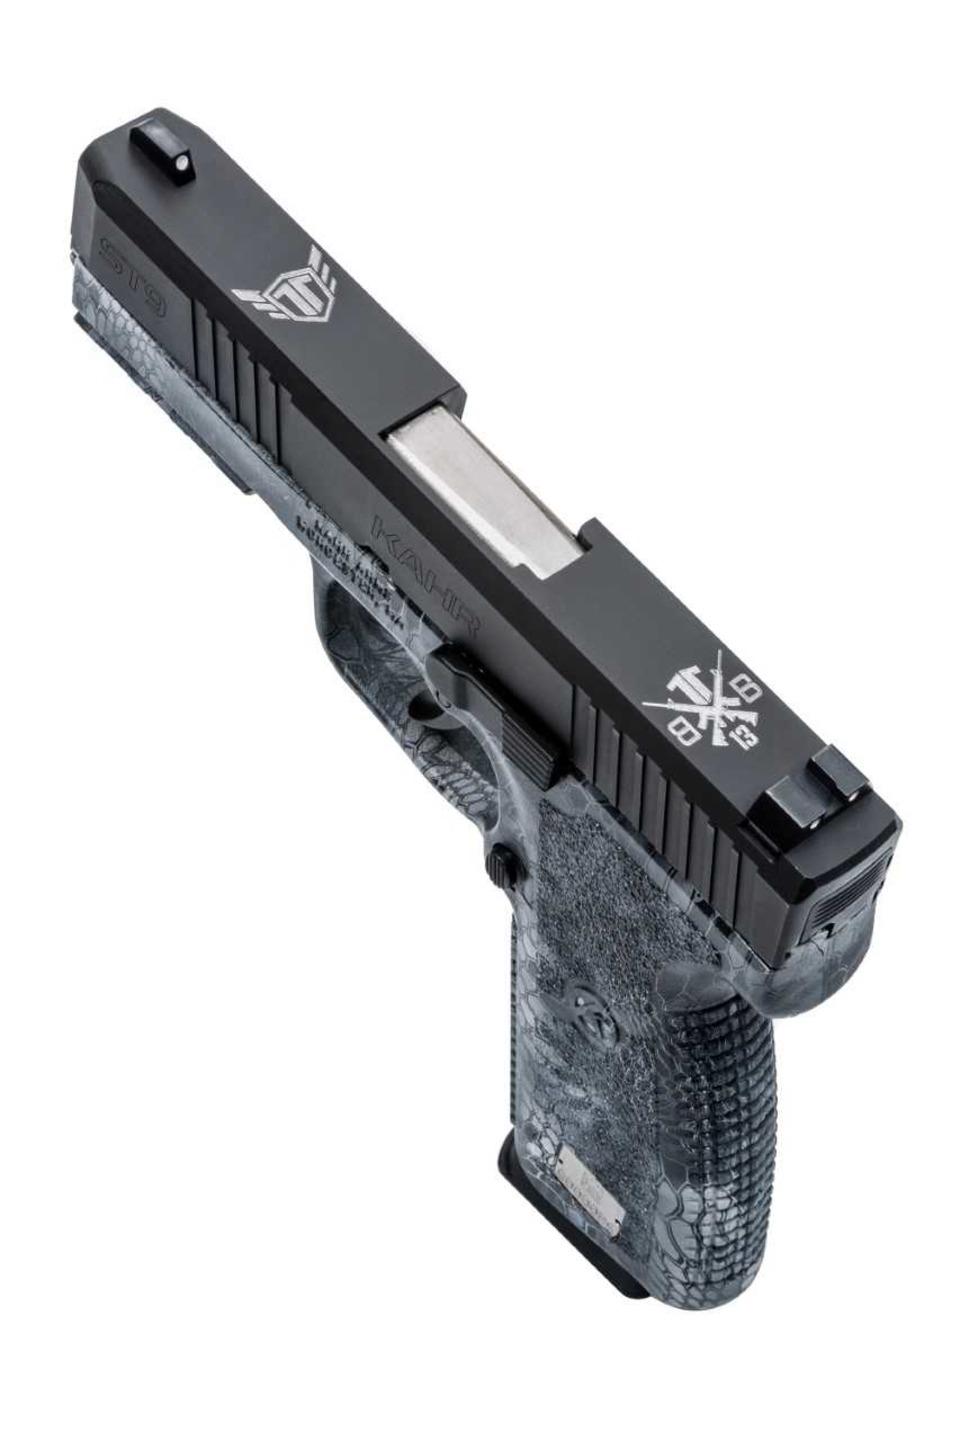 Kahr Arms Special Edition TIG Series Kahr ST9 Pistol